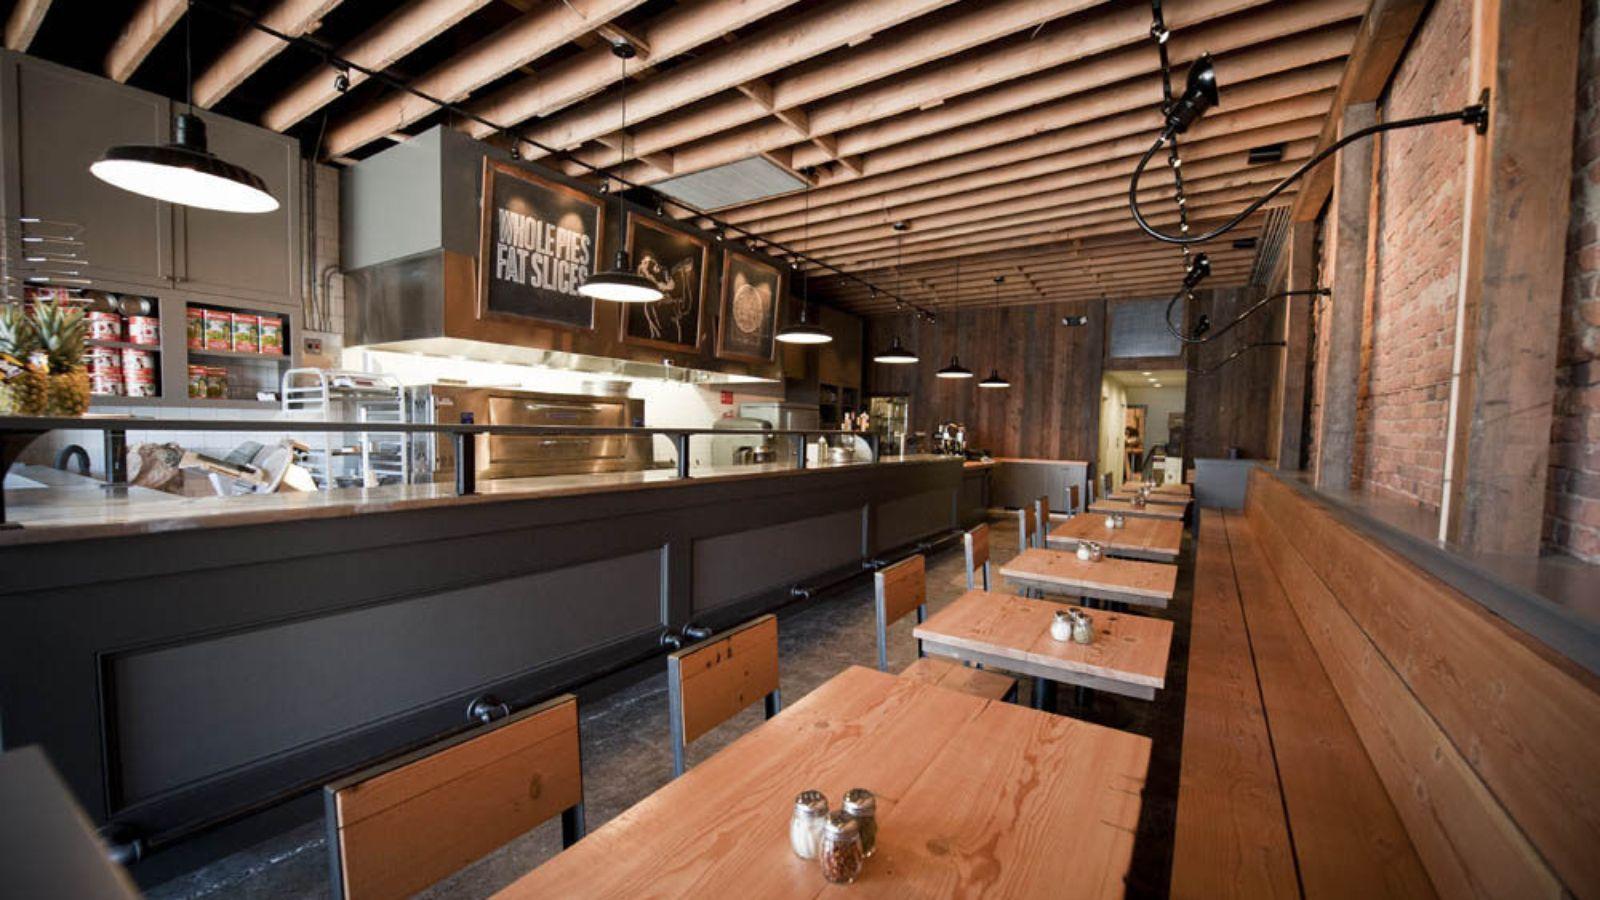 Ethan Stowell S Ballard Pizza Company Now Open Restaurant Interior Design Restaurant Design Fast Casual Restaurant